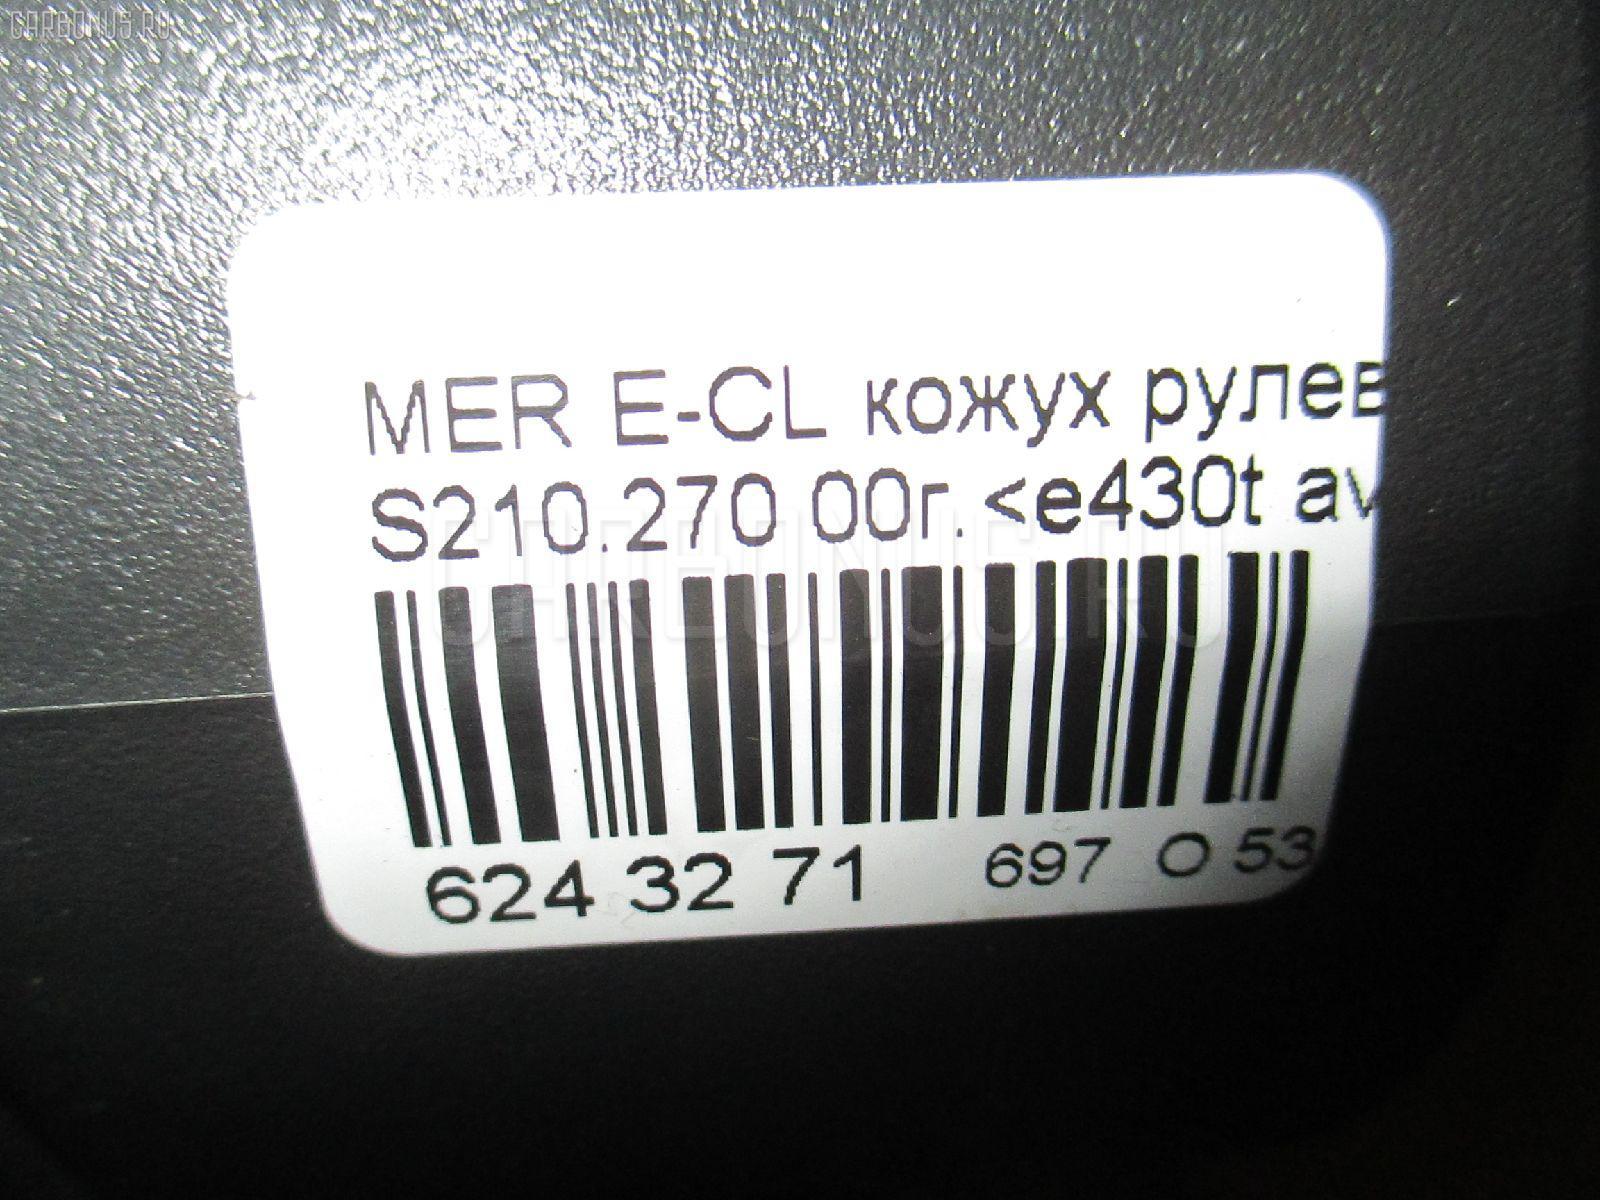 Кожух рулевой колонки MERCEDES-BENZ E-CLASS STATION WAGON S210.270 Фото 7